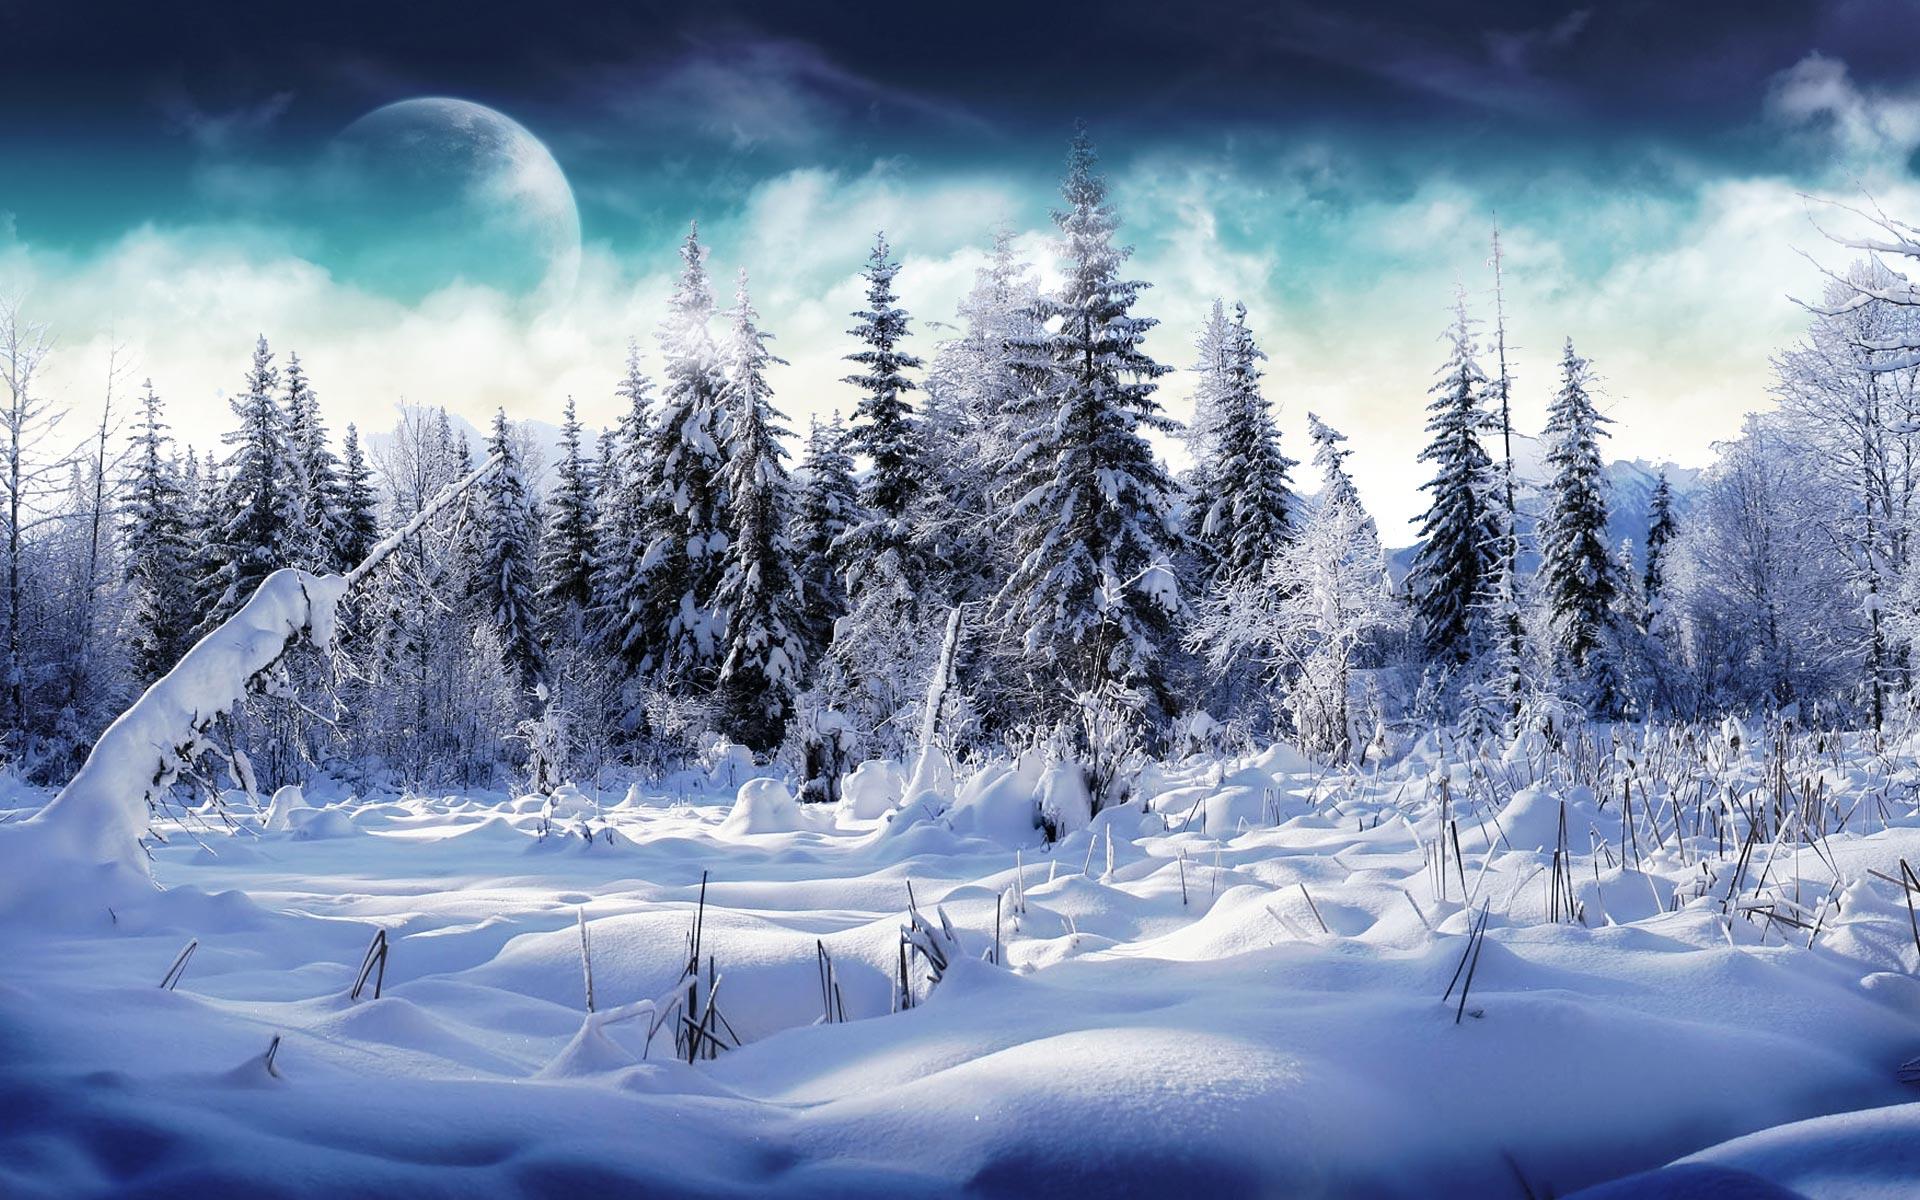 December · 2011 · Ukraine travel blog